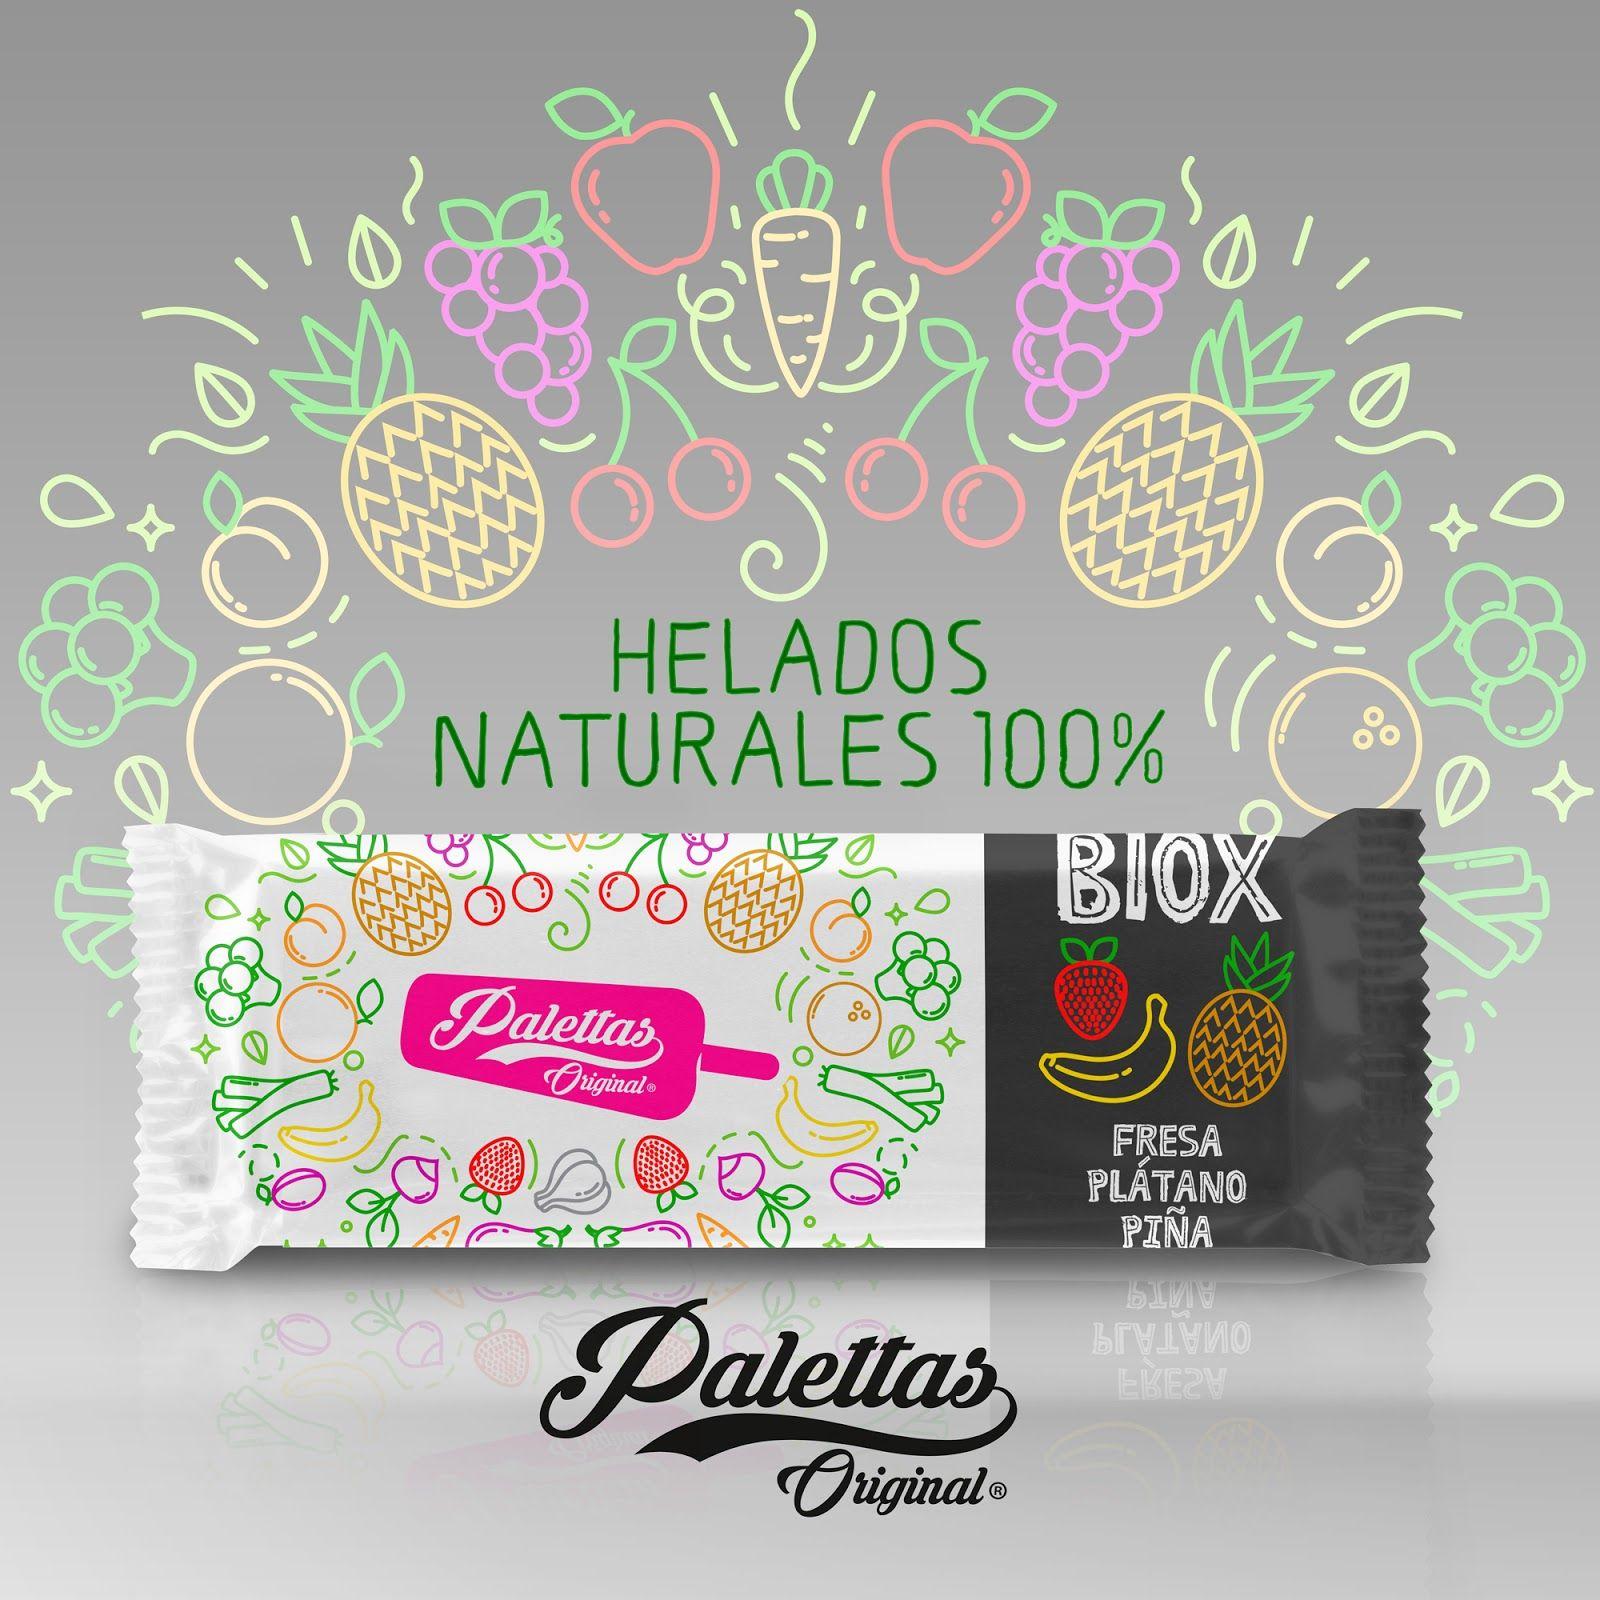 Palettes Ice Creams 2 0 Ice Cream World Ice Cream Ice Cream Packaging